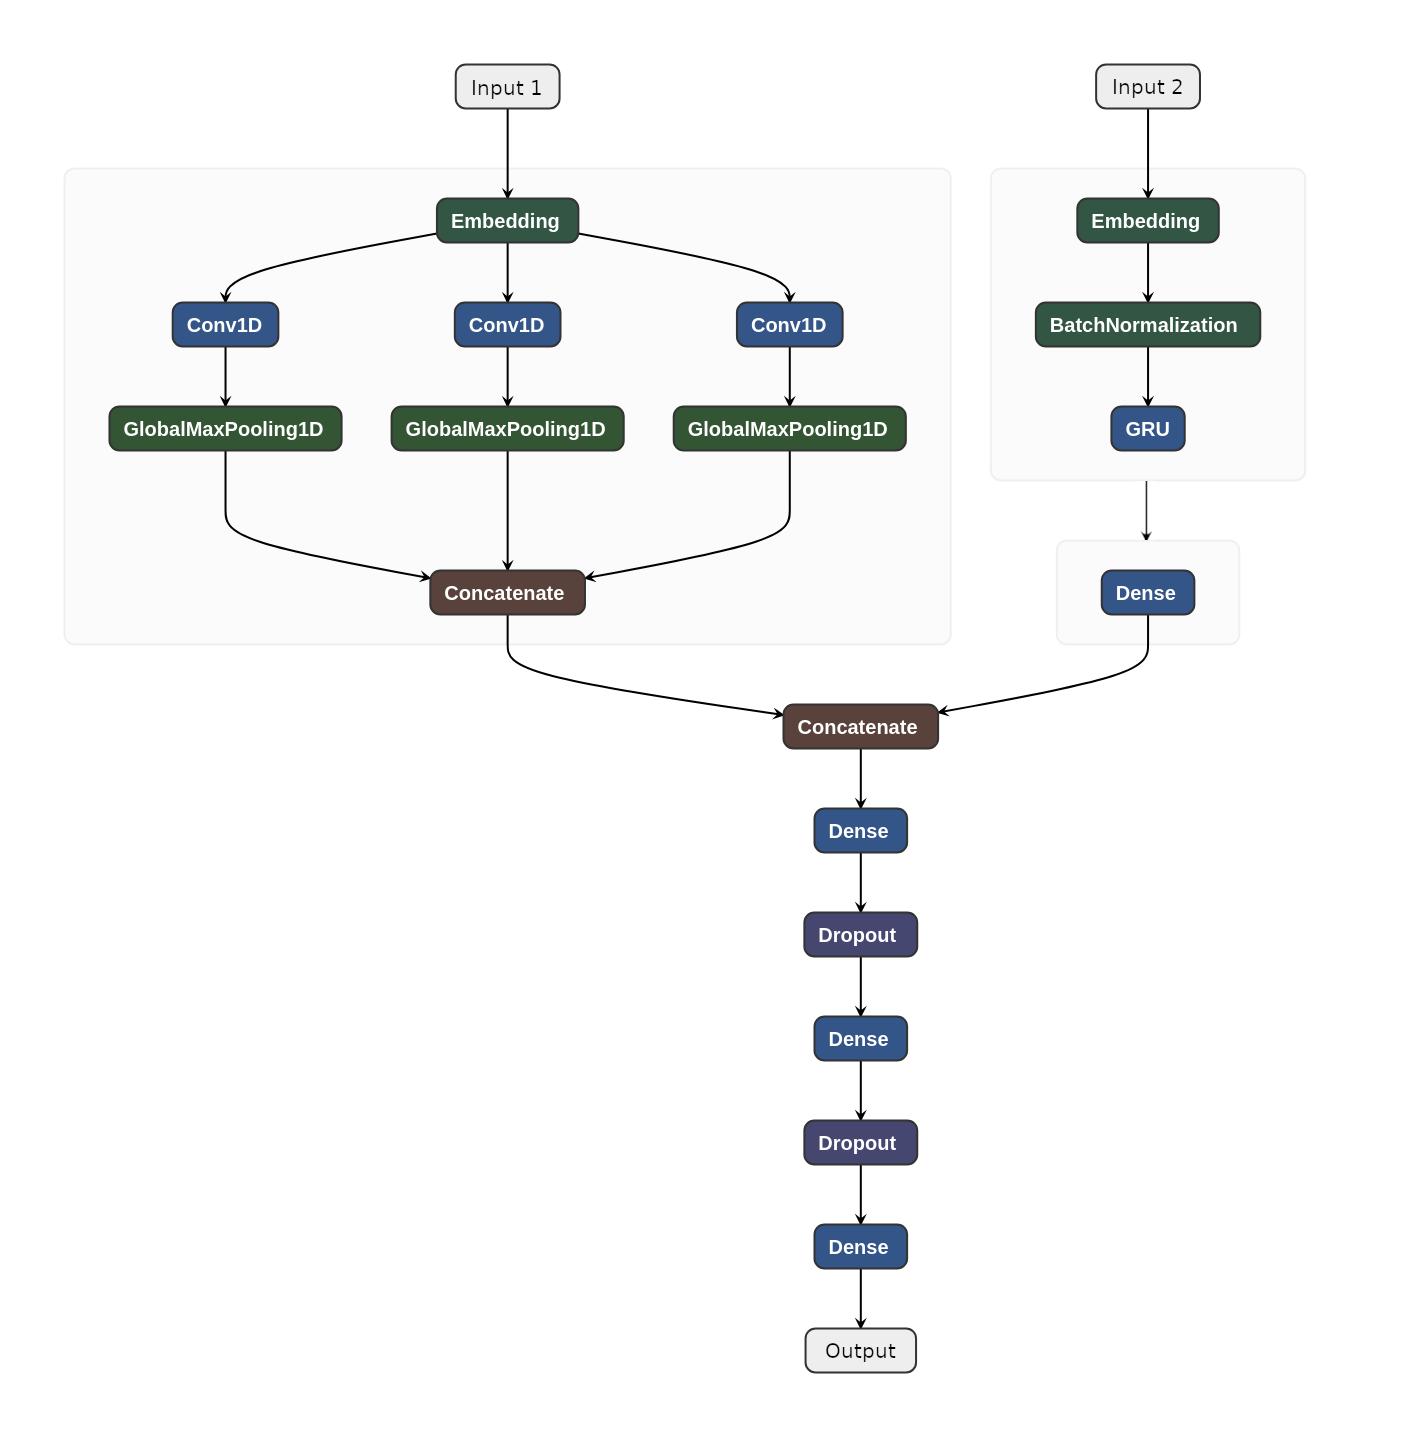 Architecture of the GRU-CNN Model